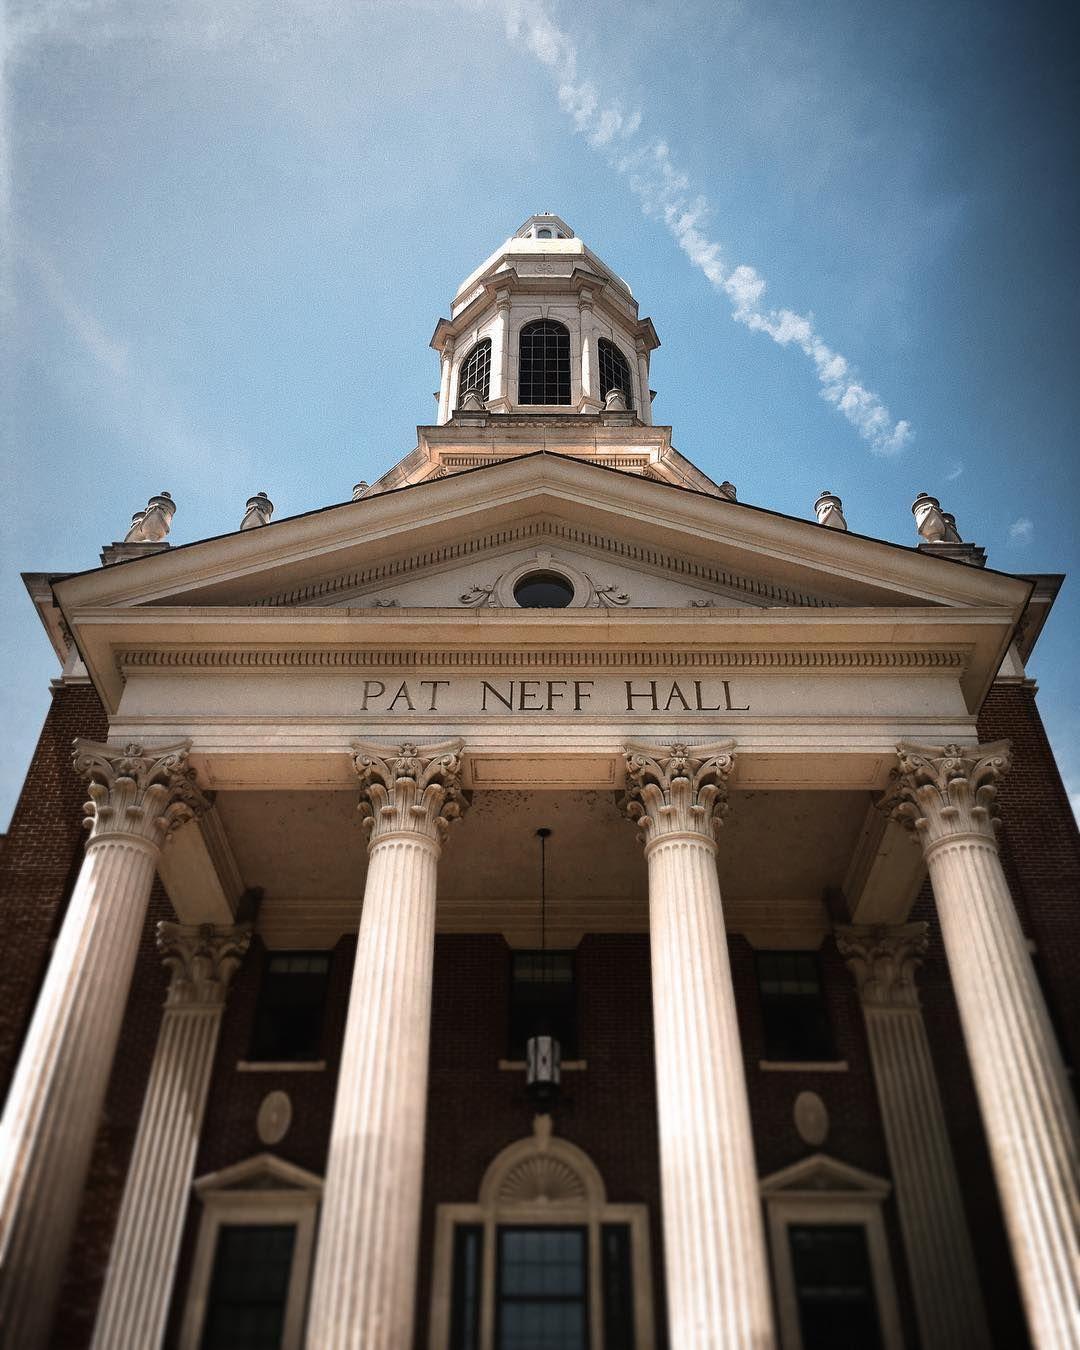 Pat Neff Hall Baylor University Baylor Baylor Campus